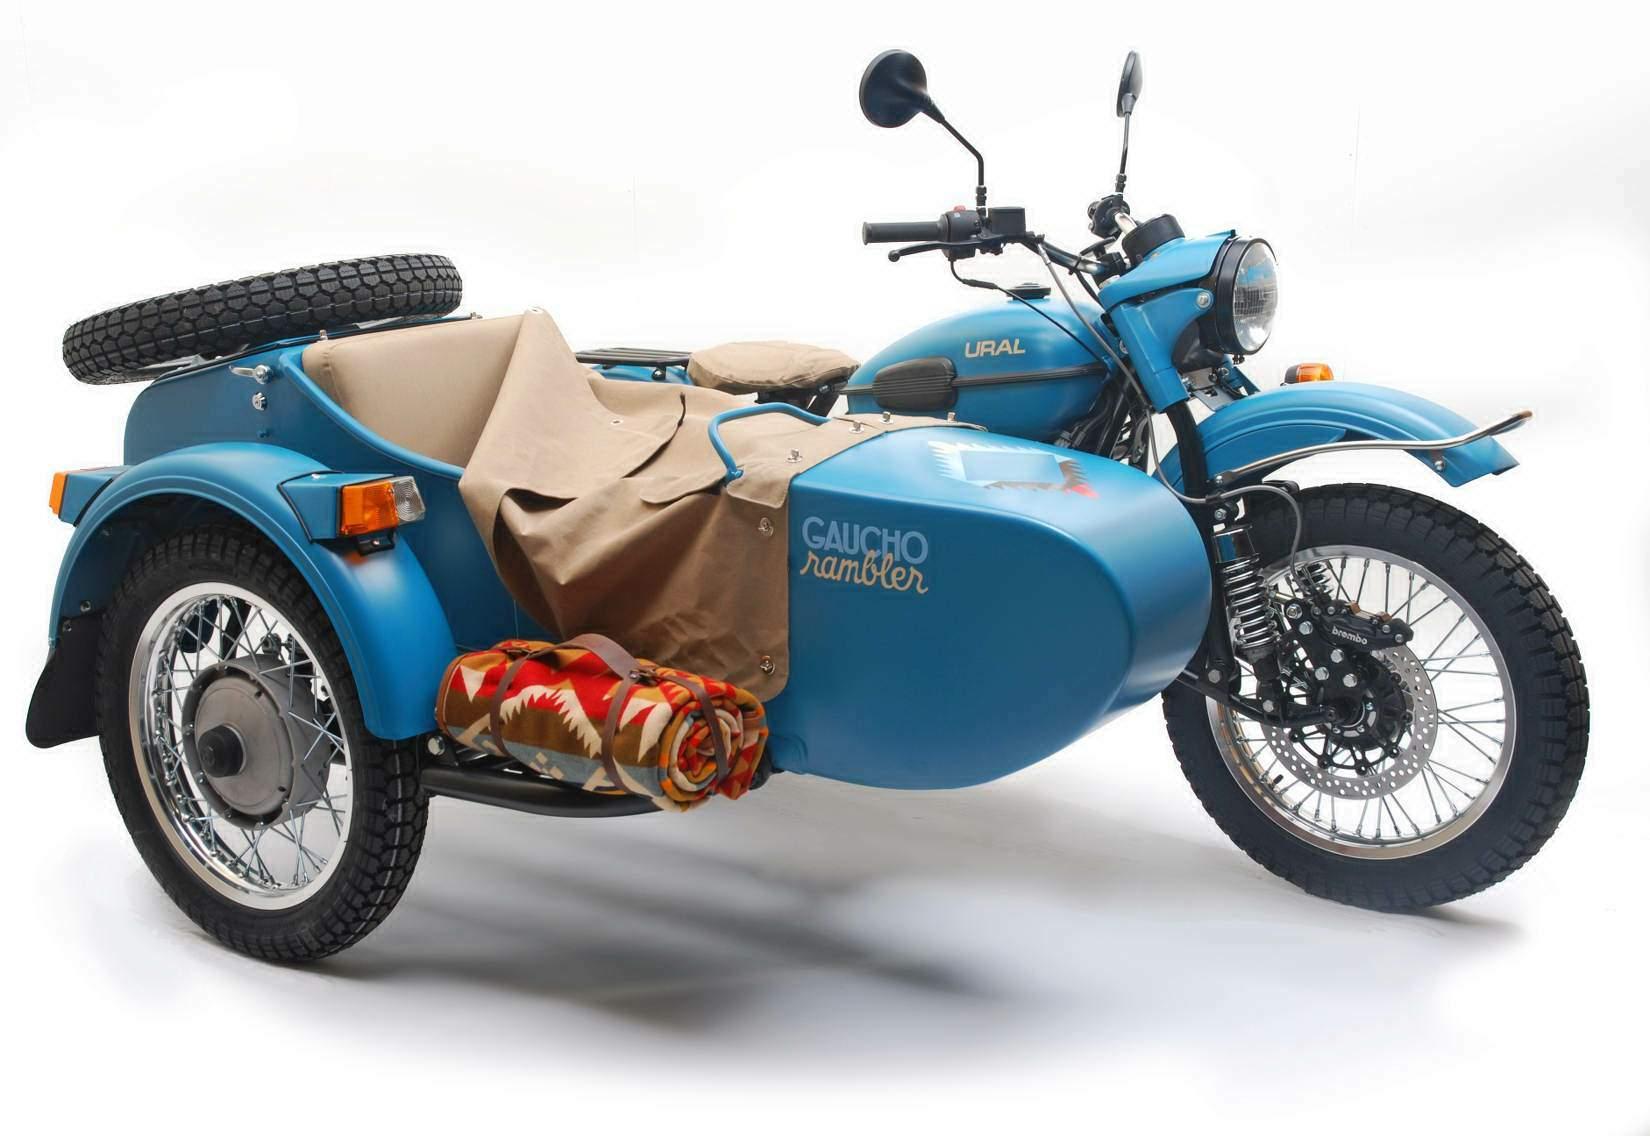 Ural Gaucho Rambler technical specifications